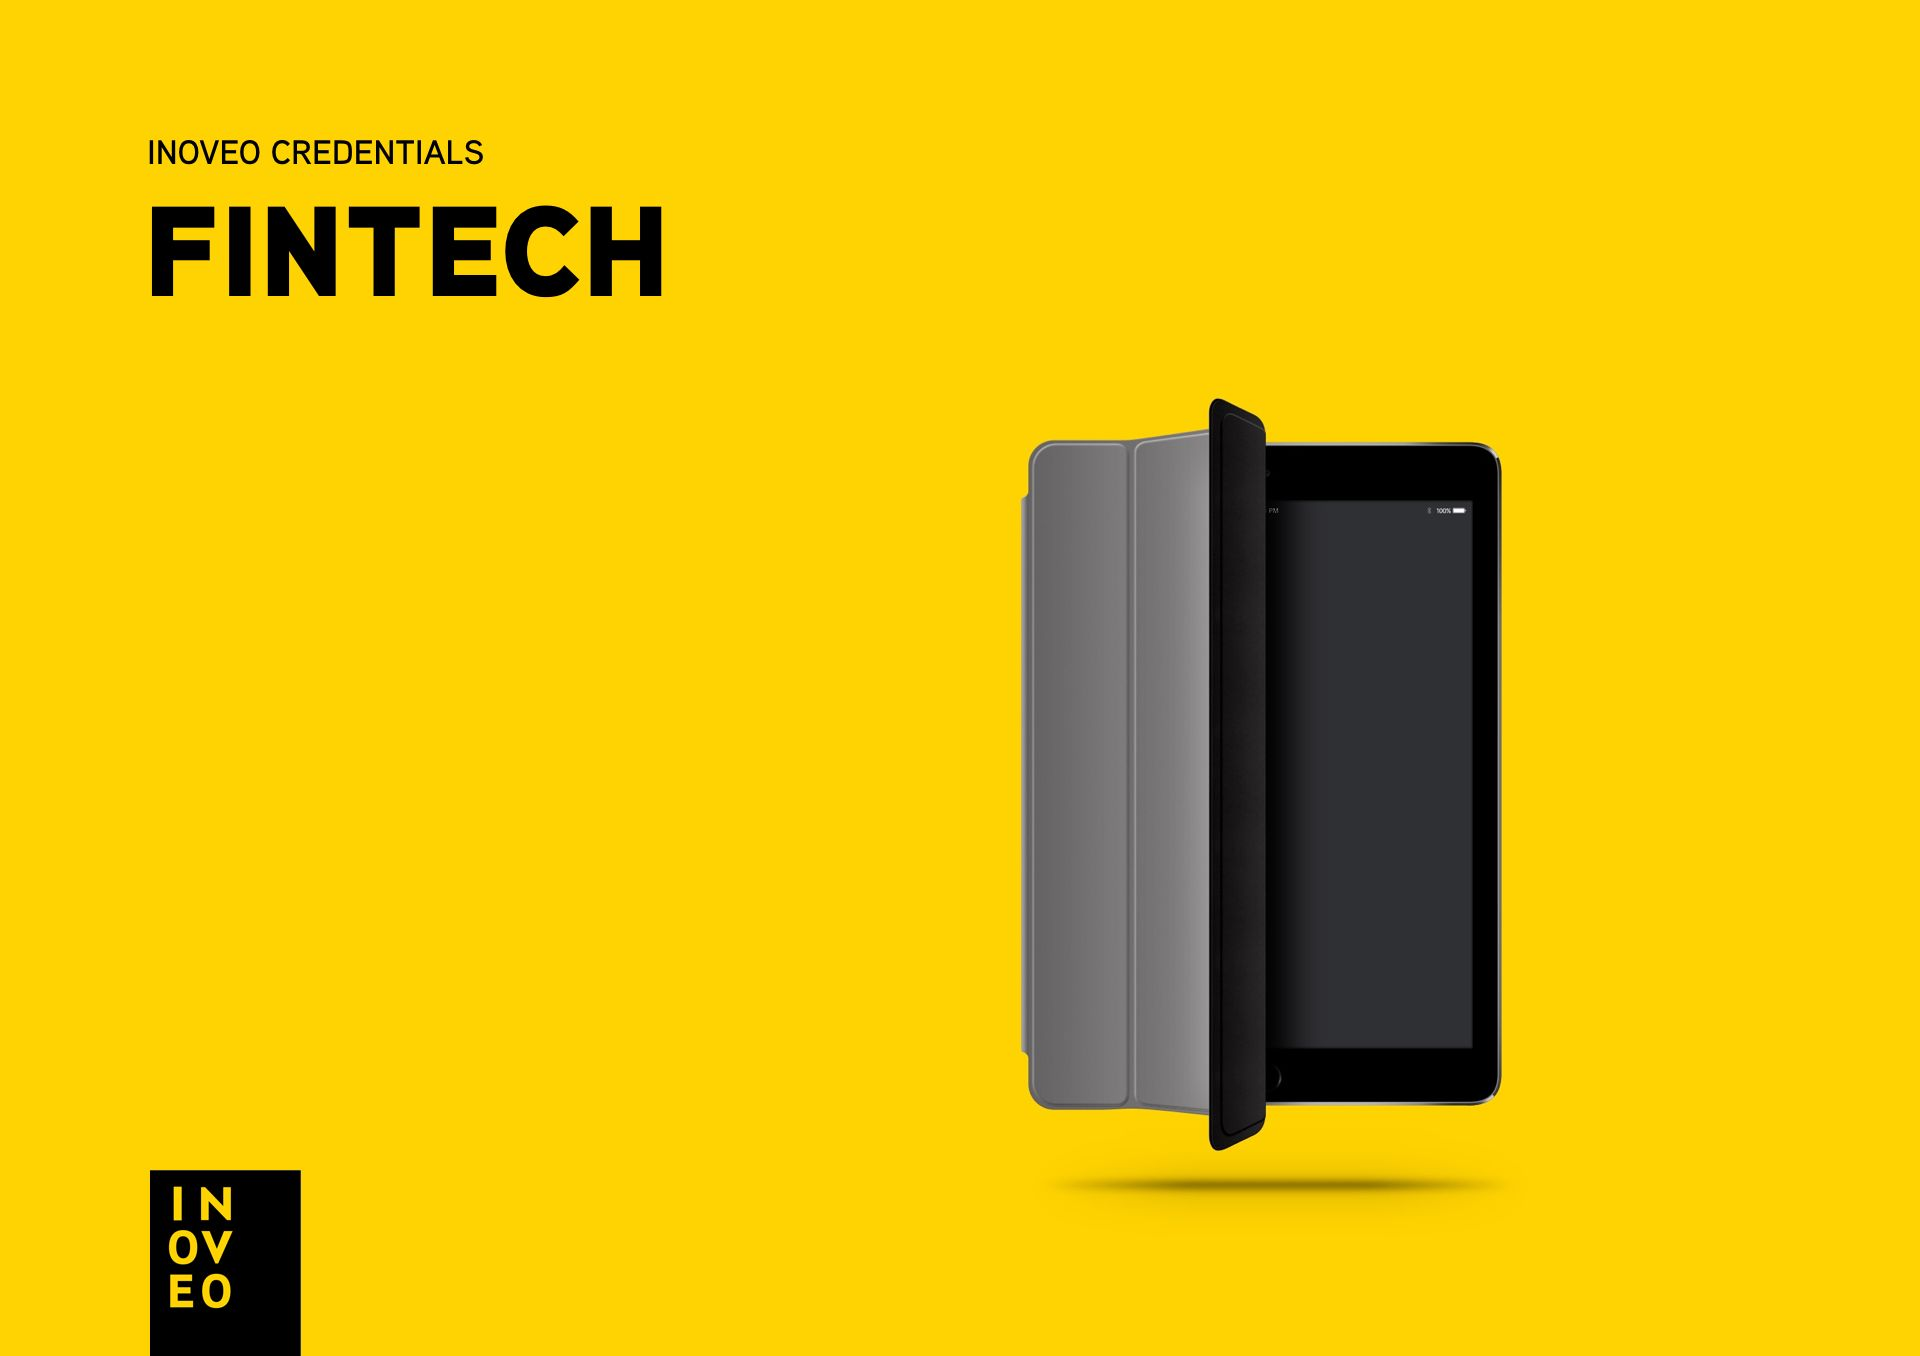 fintech credentials INOVEO branding